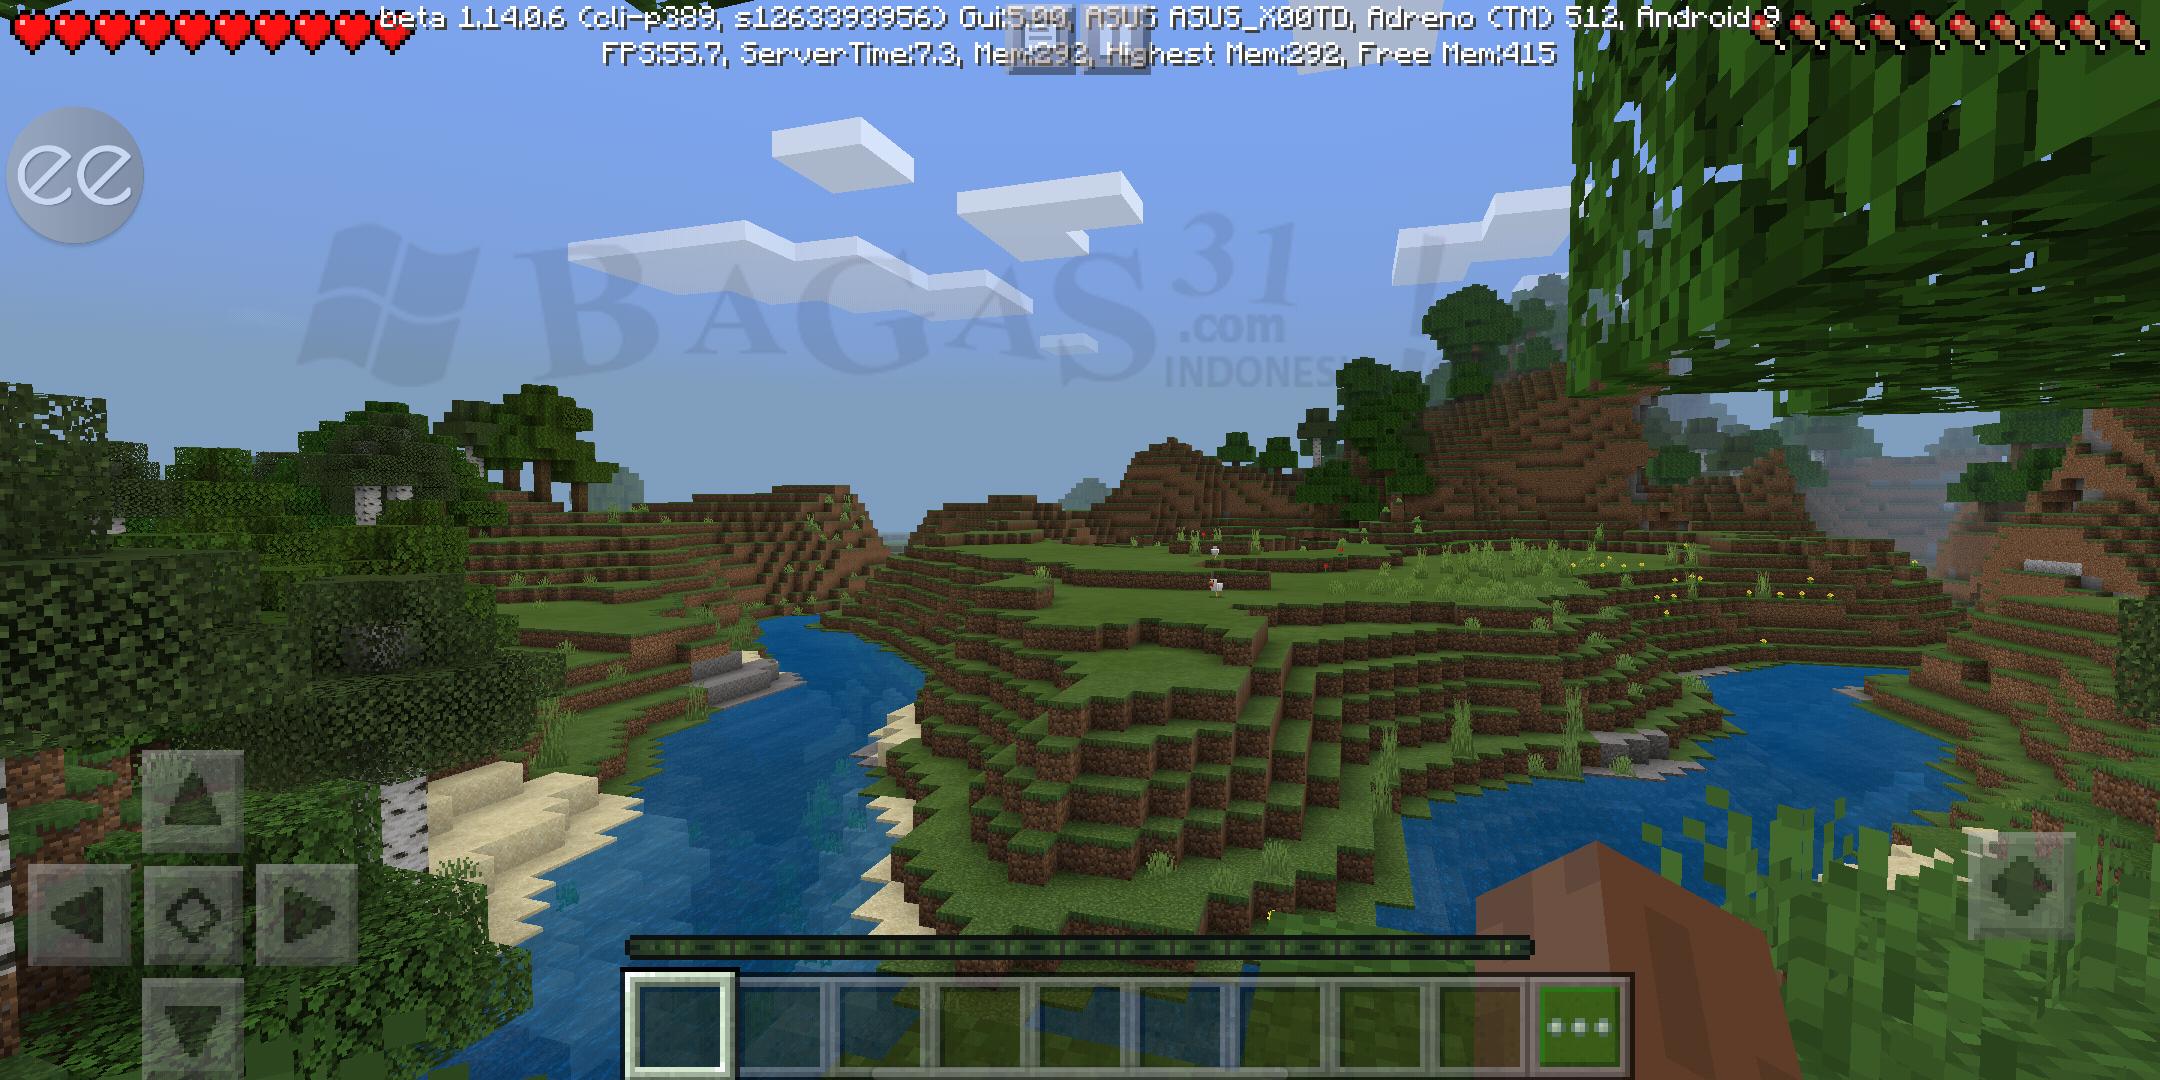 Minecraft Pocket Edition 1.14.0.6 Mod APK